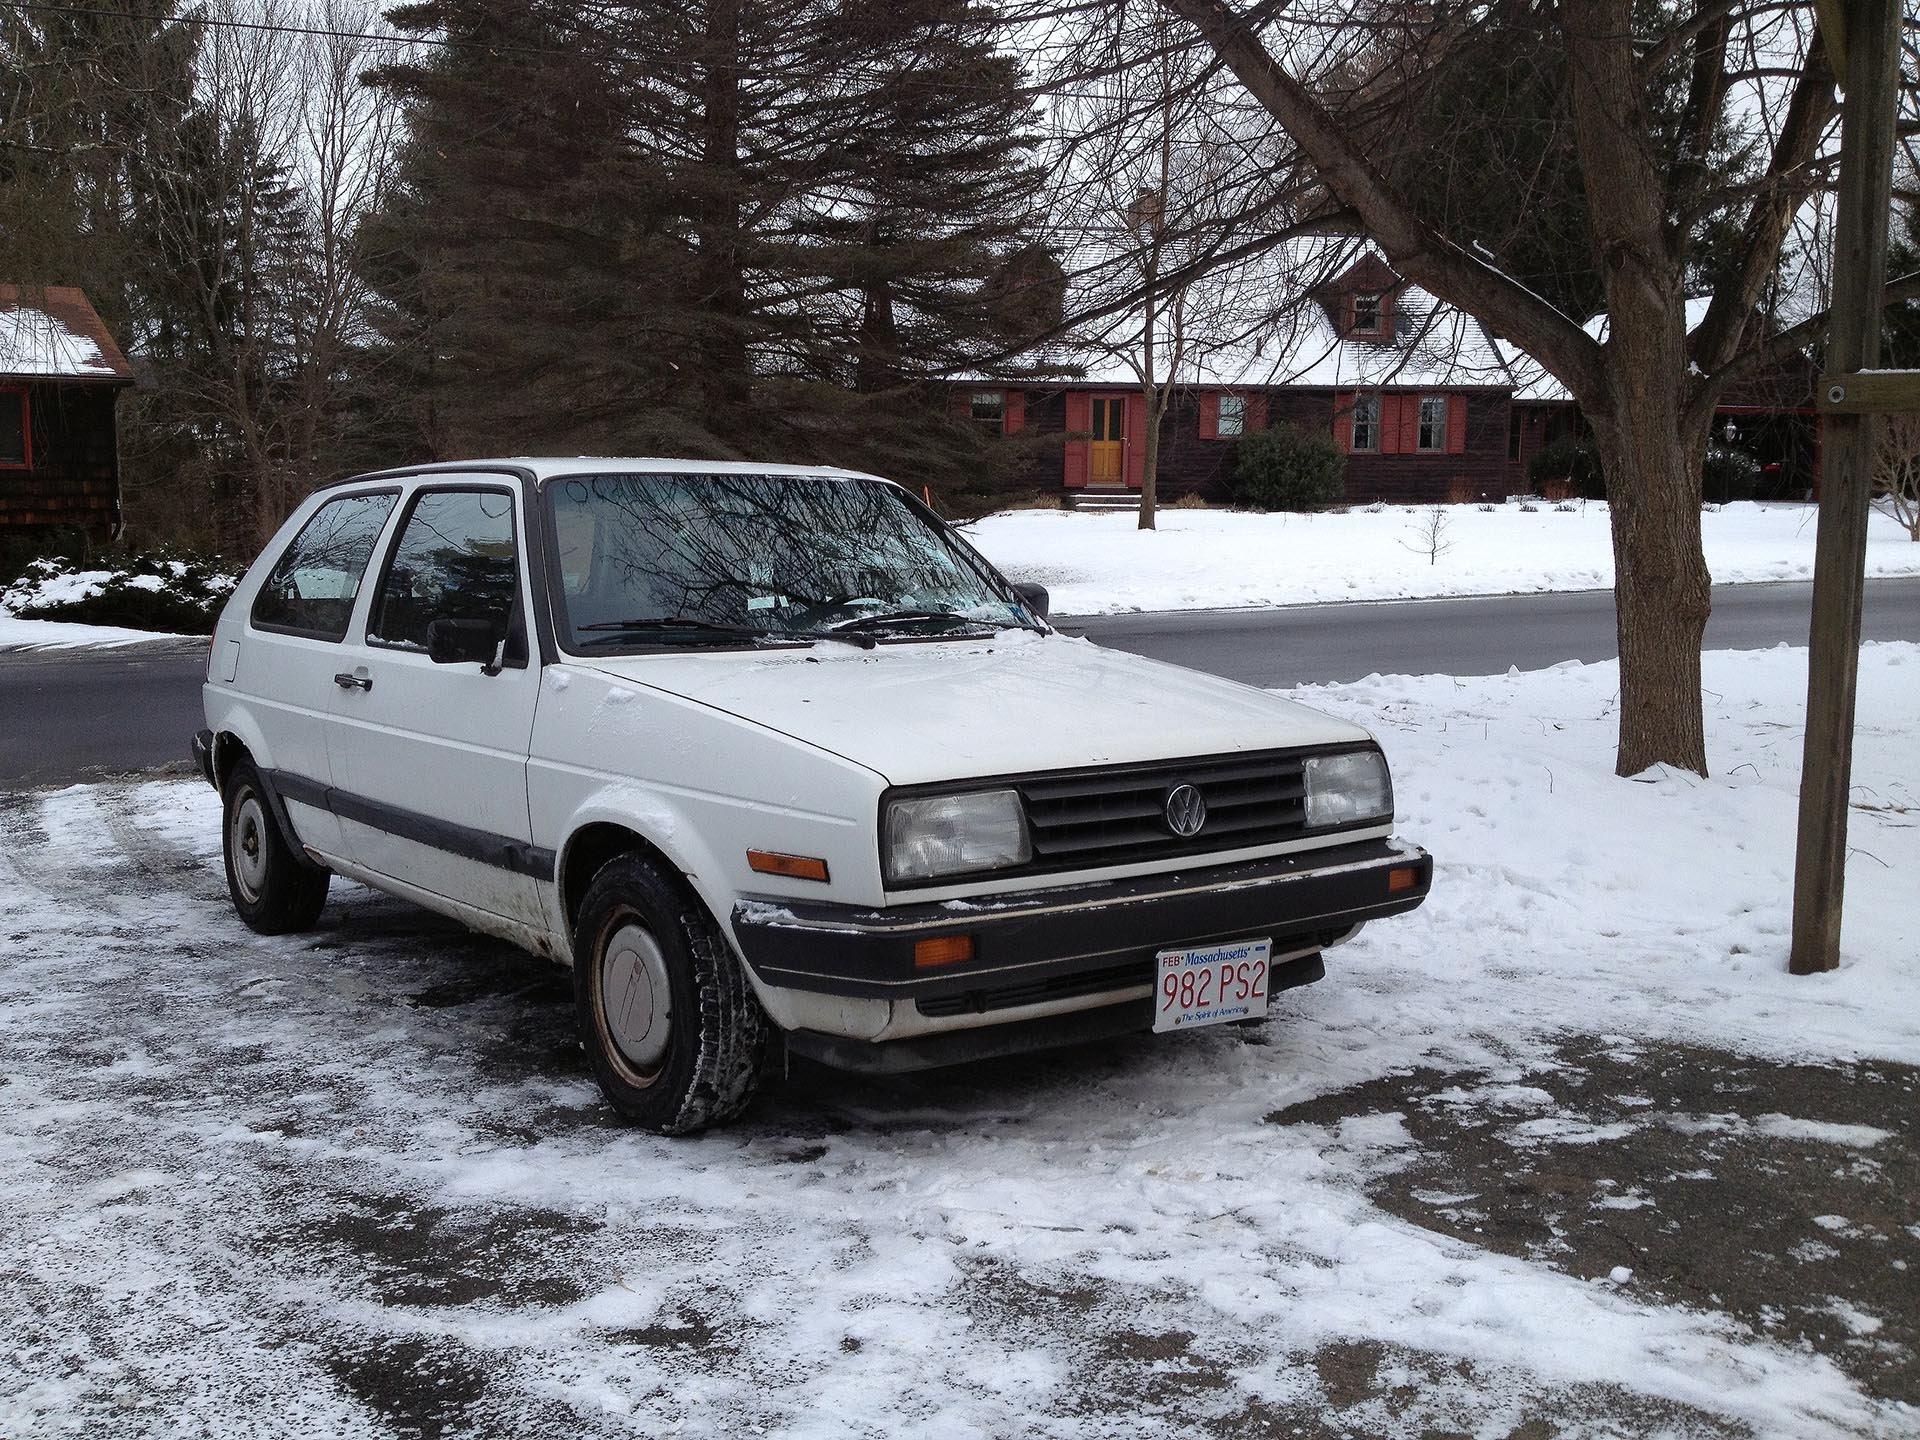 Original Alpine White 1989 Golf 41k miles